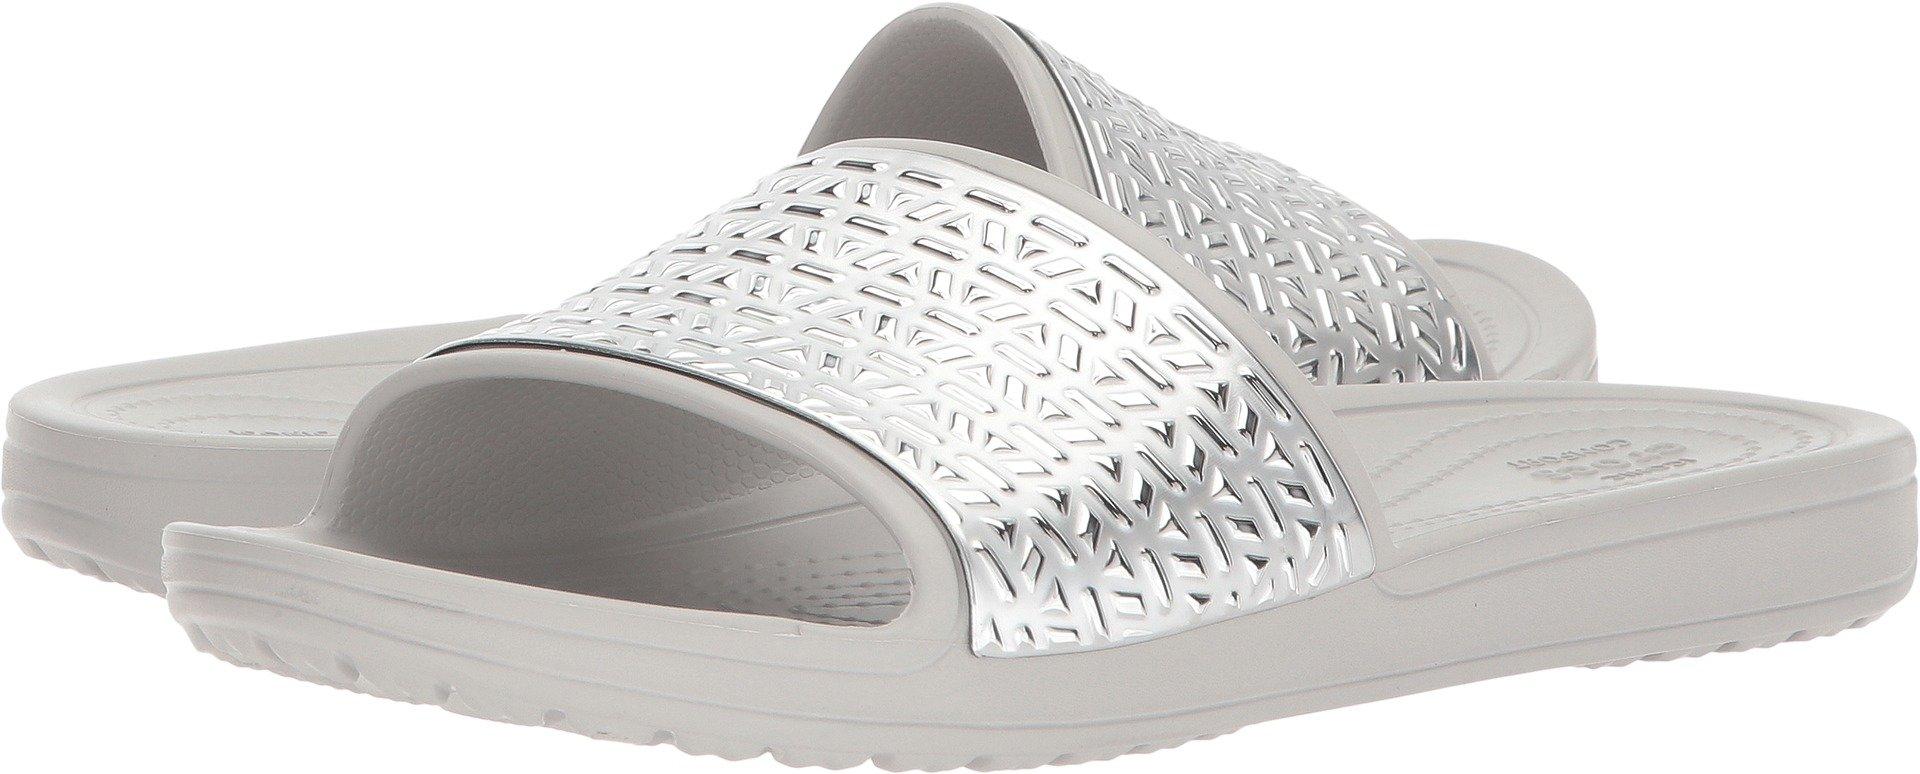 Crocs Women's Sloane Graphic Etched W Slide Sandal, Pearl White/Silver, 9 M US